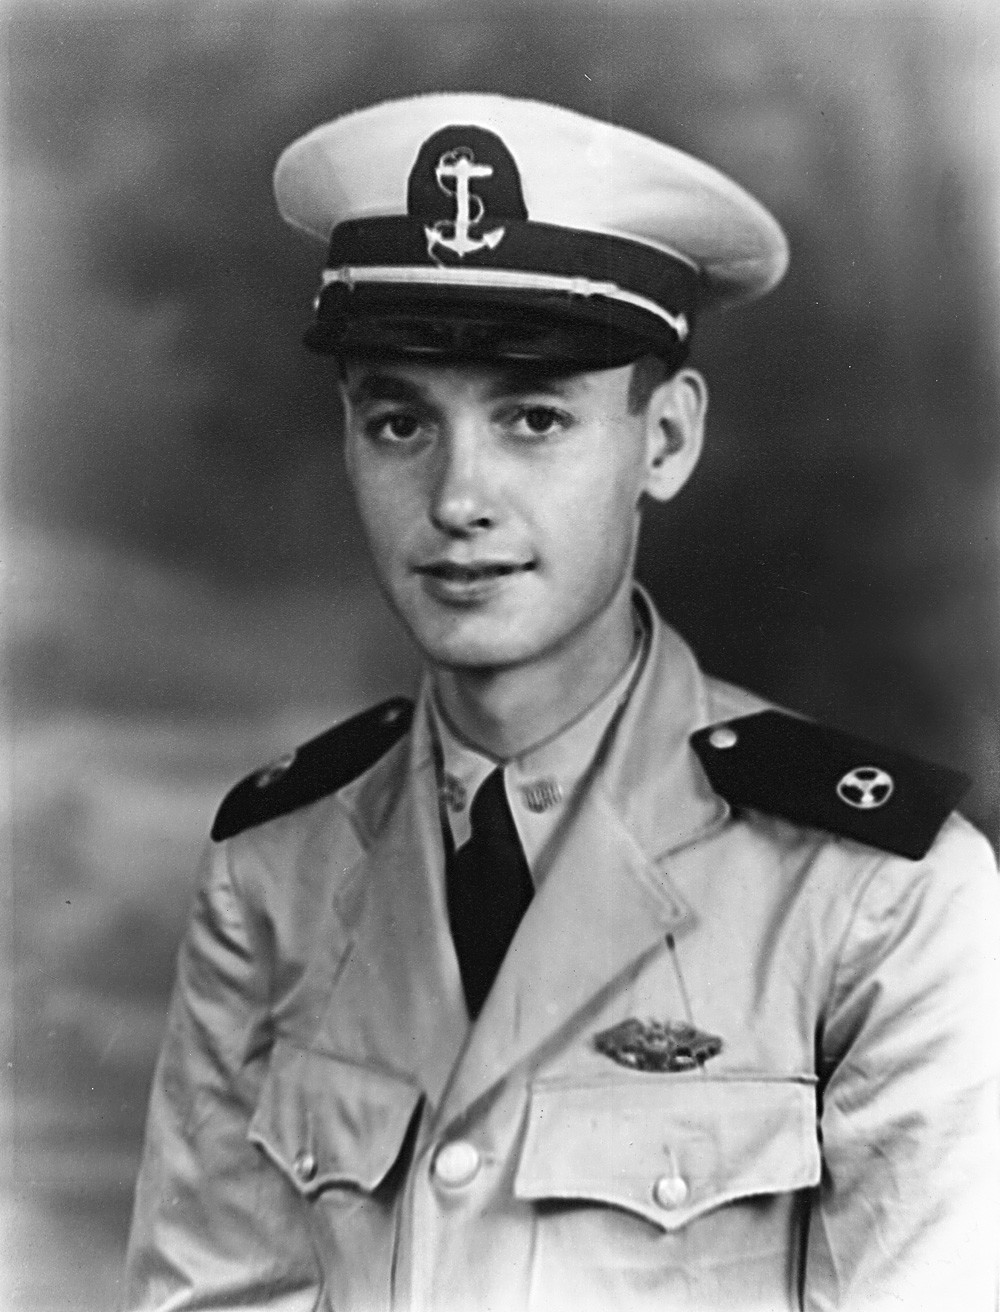 Херман Мелтон, јули 1943